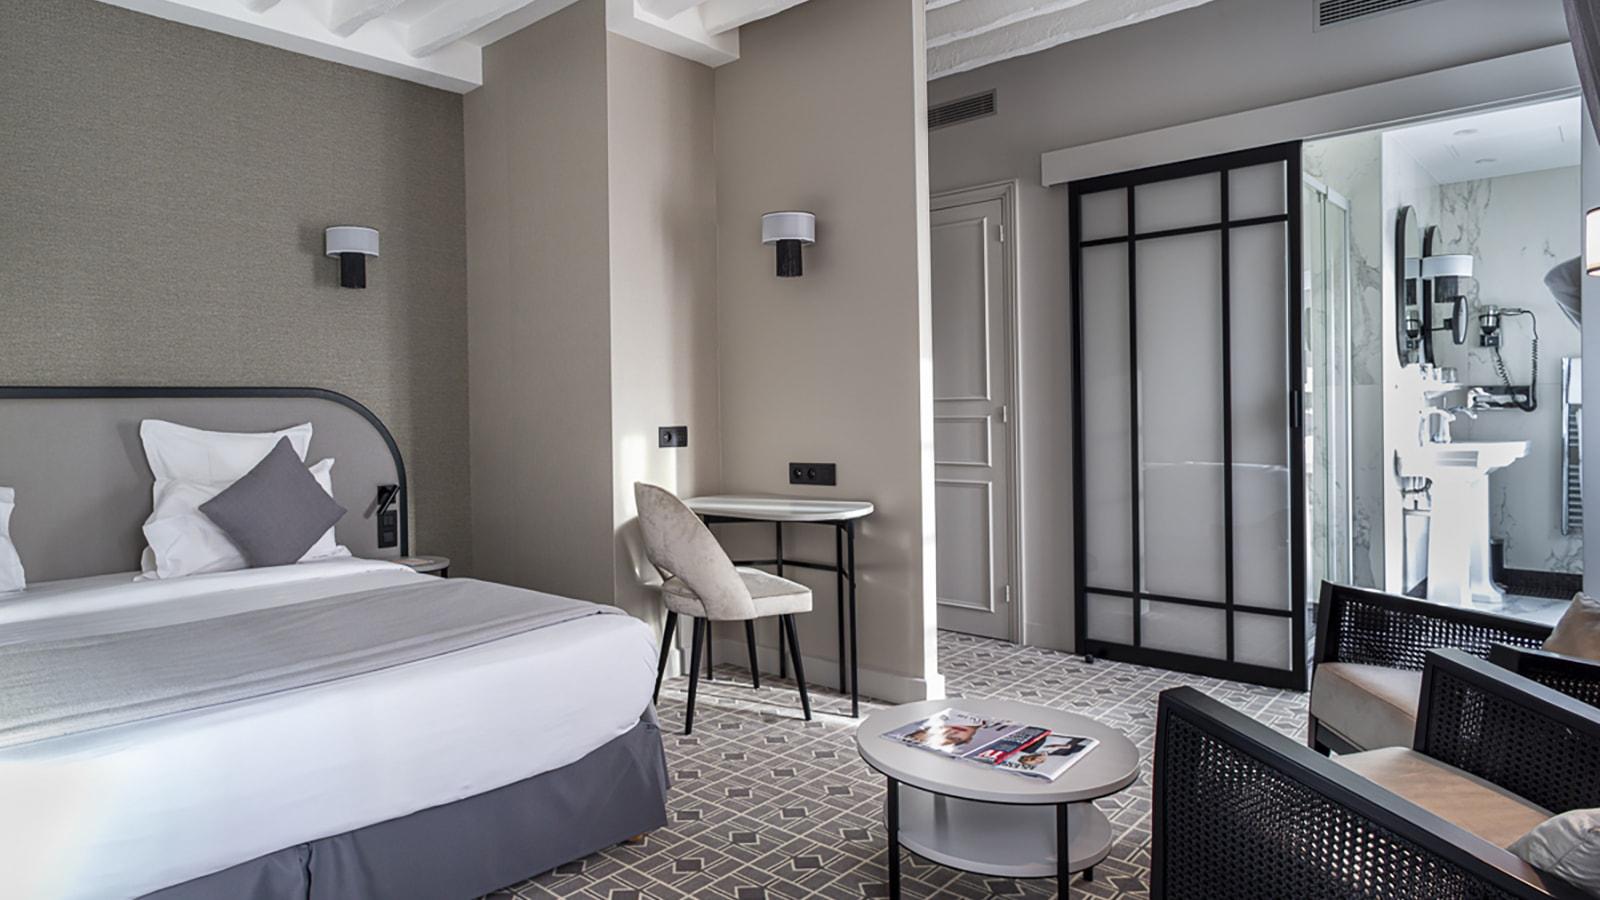 EFI Design Hotel Lenox Paris Efi Design (8) 1162